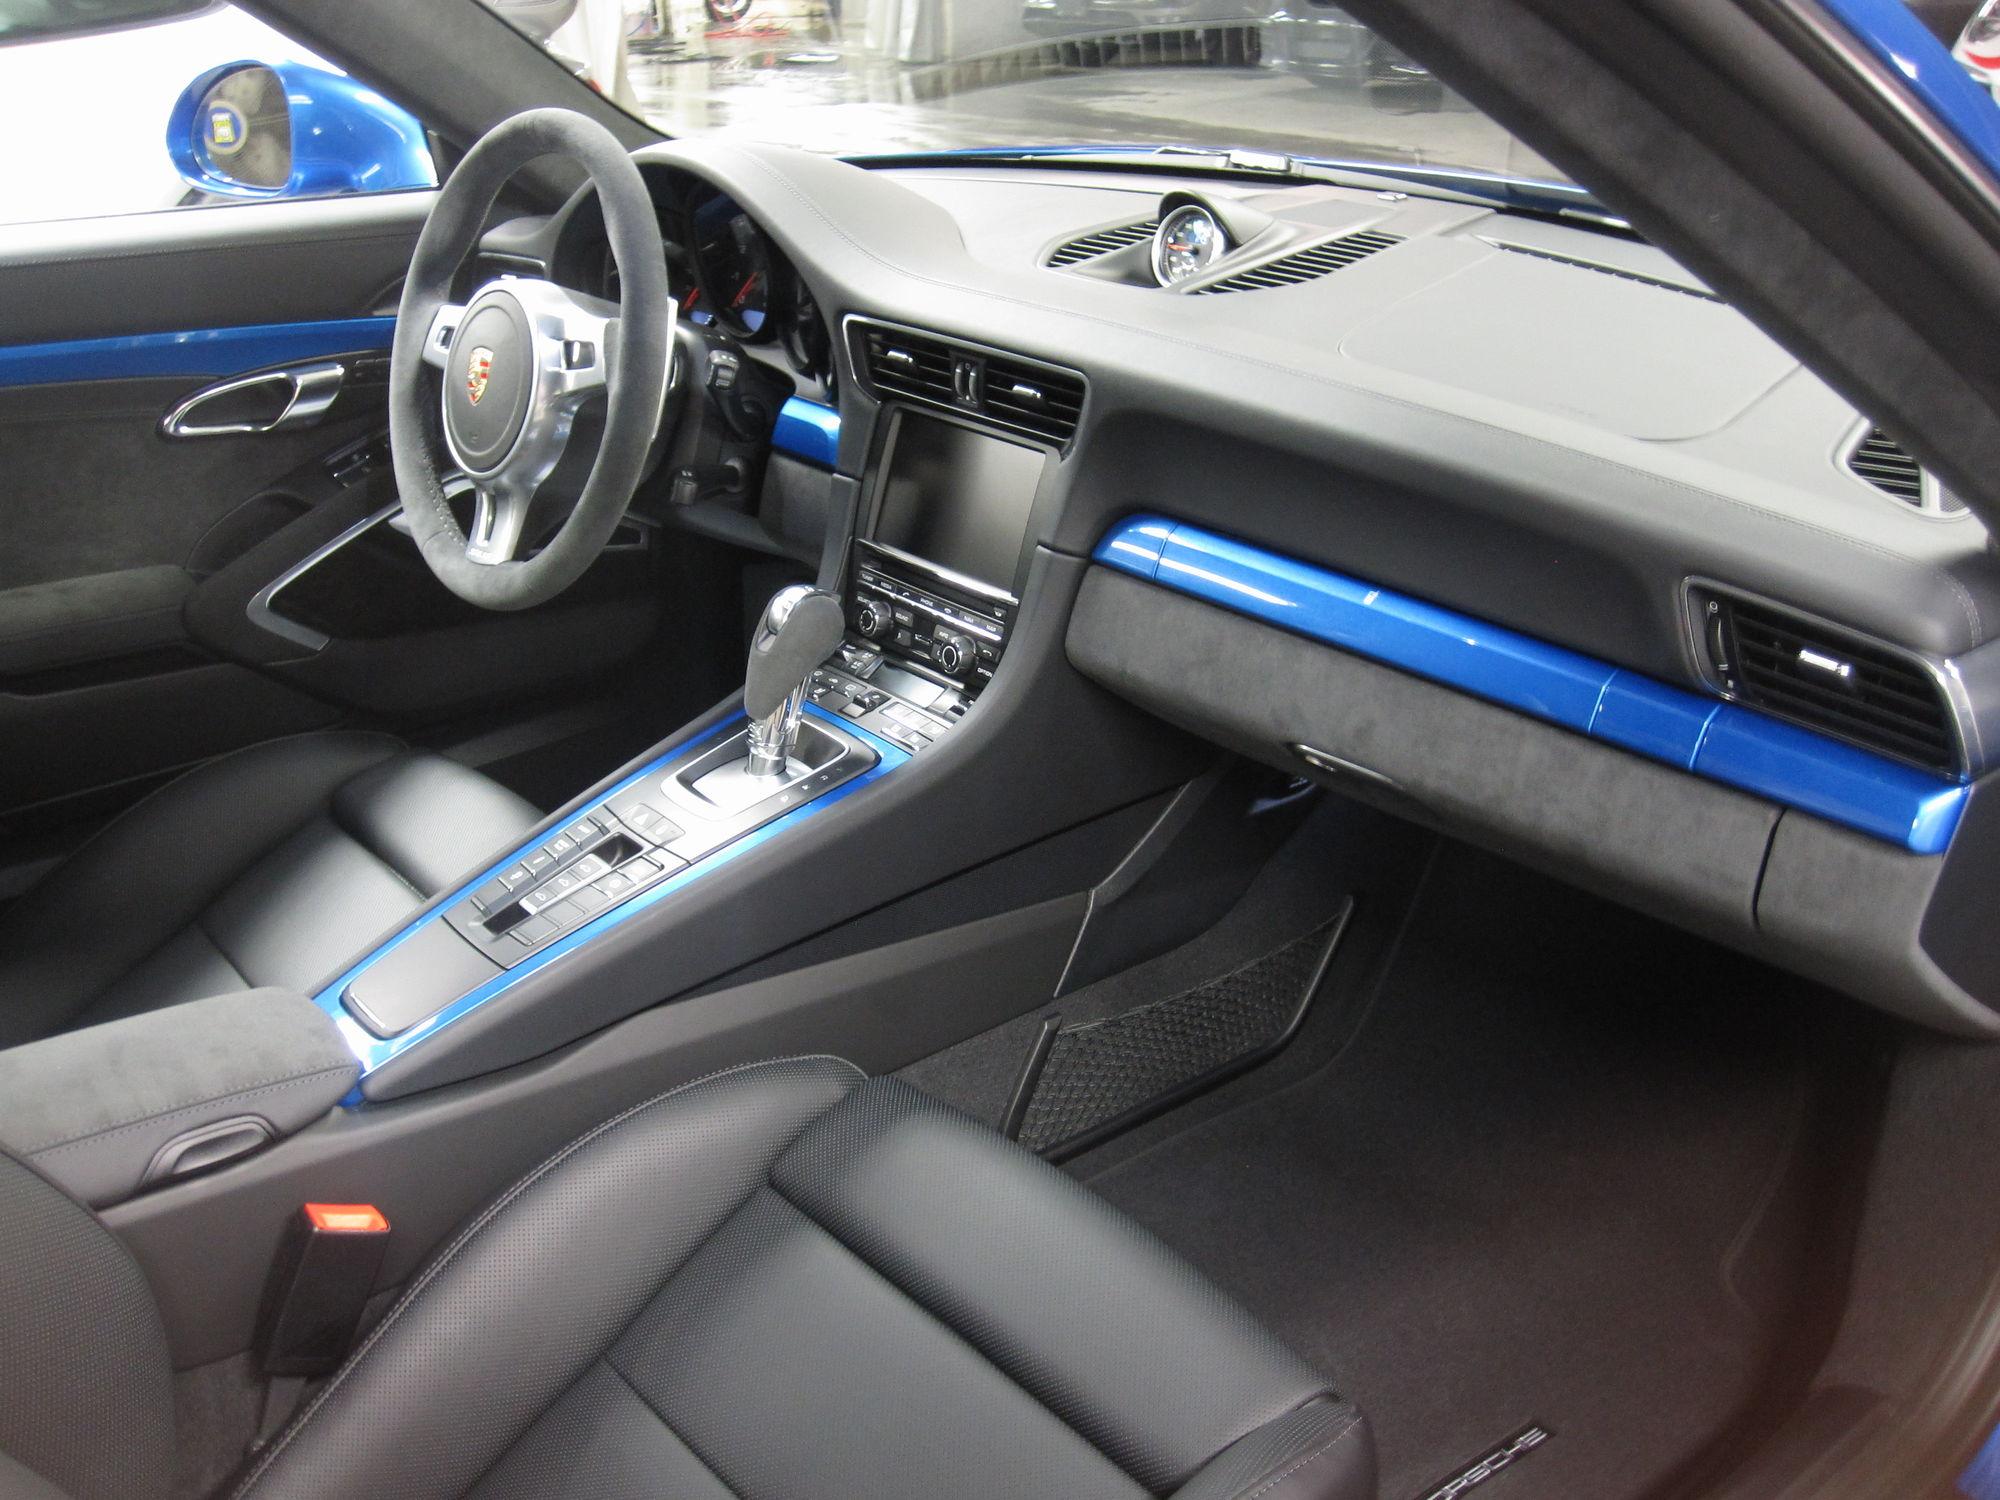 GTS Interior package with leather seats? - Rennlist - Porsche ...